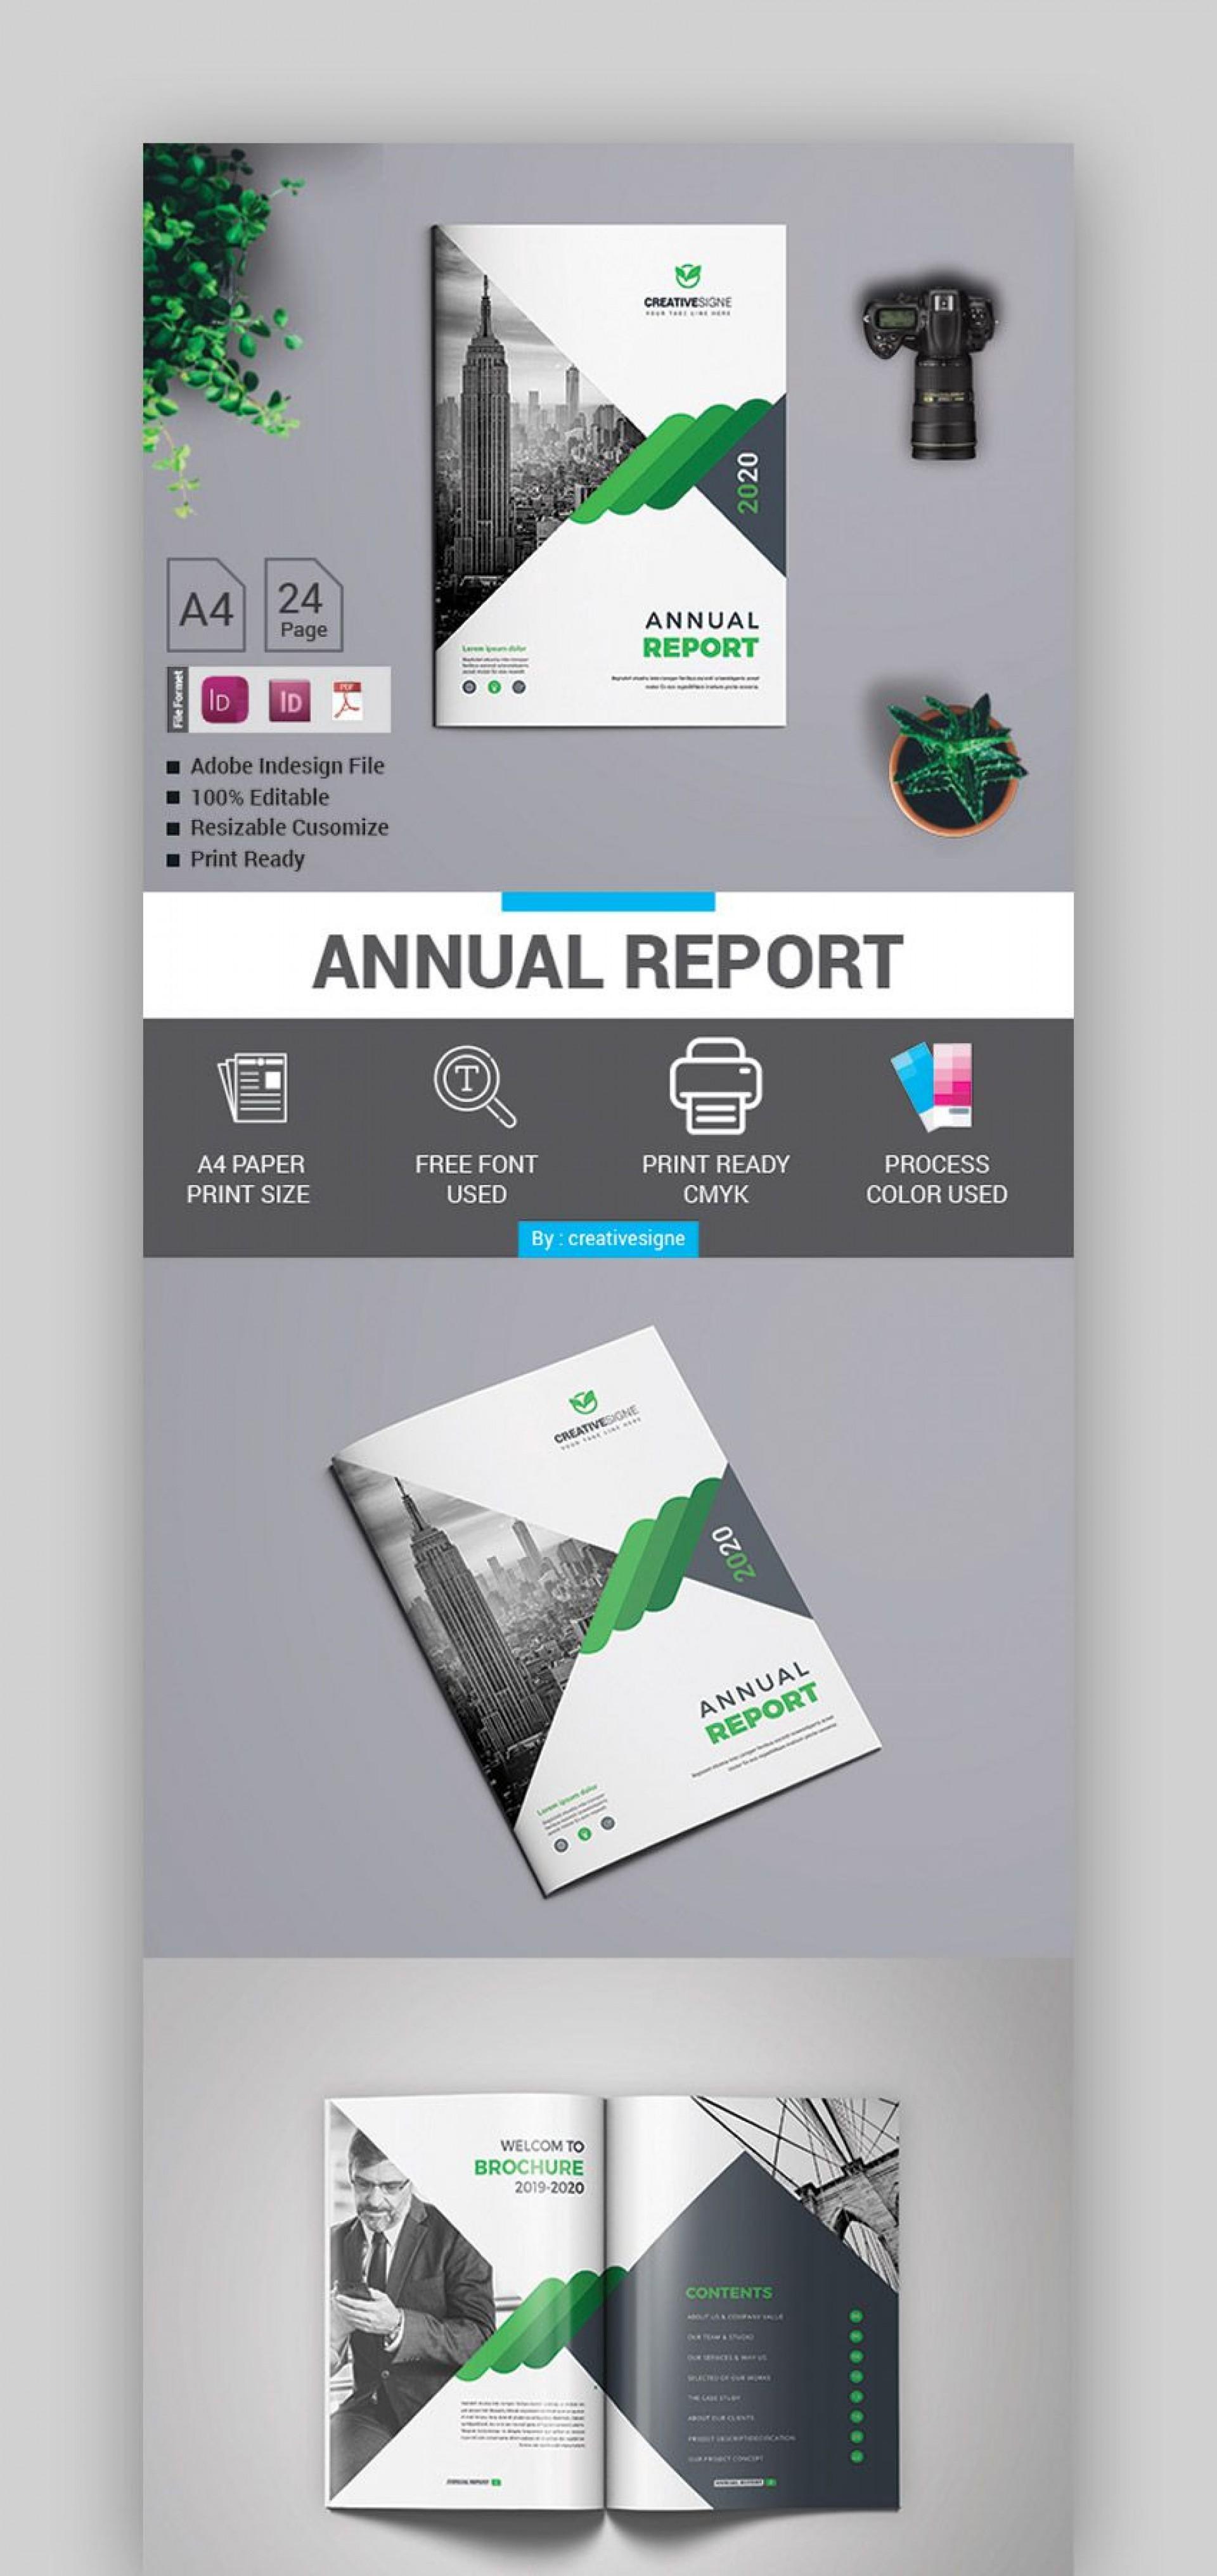 004 Unique Free Indesign Annual Report Template Download Concept 1920